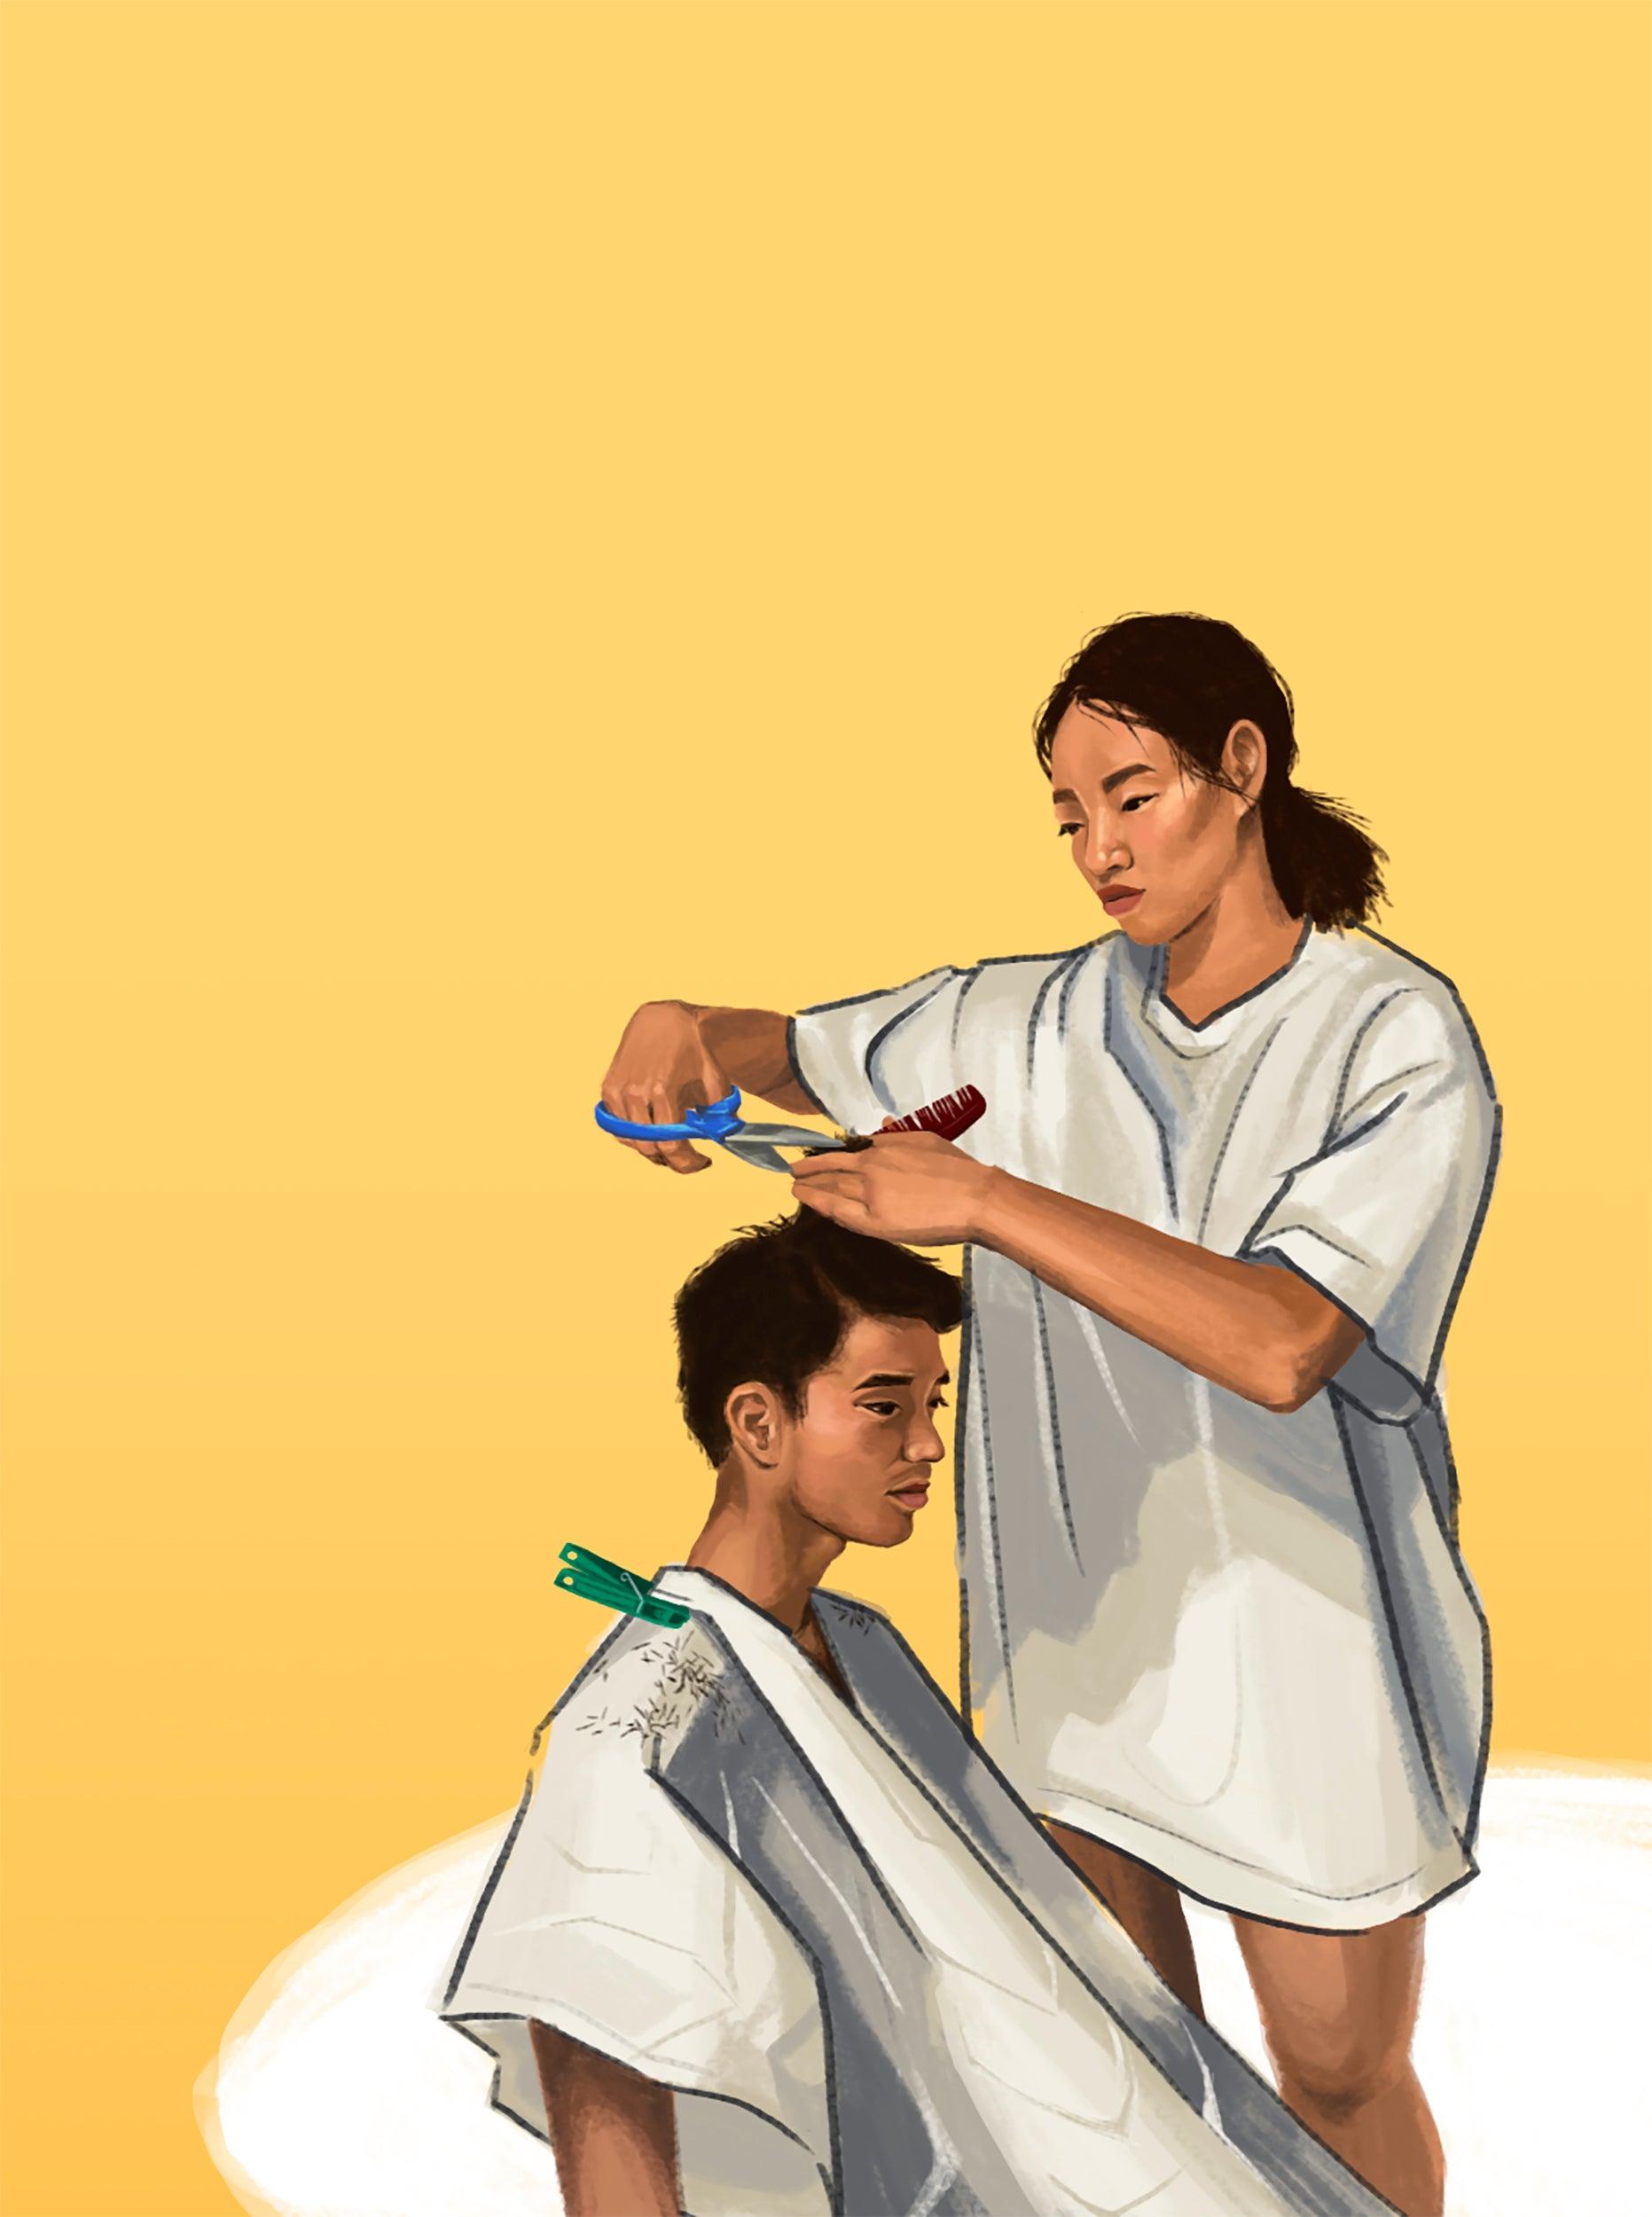 Illustration of woman cutting boy's hair.